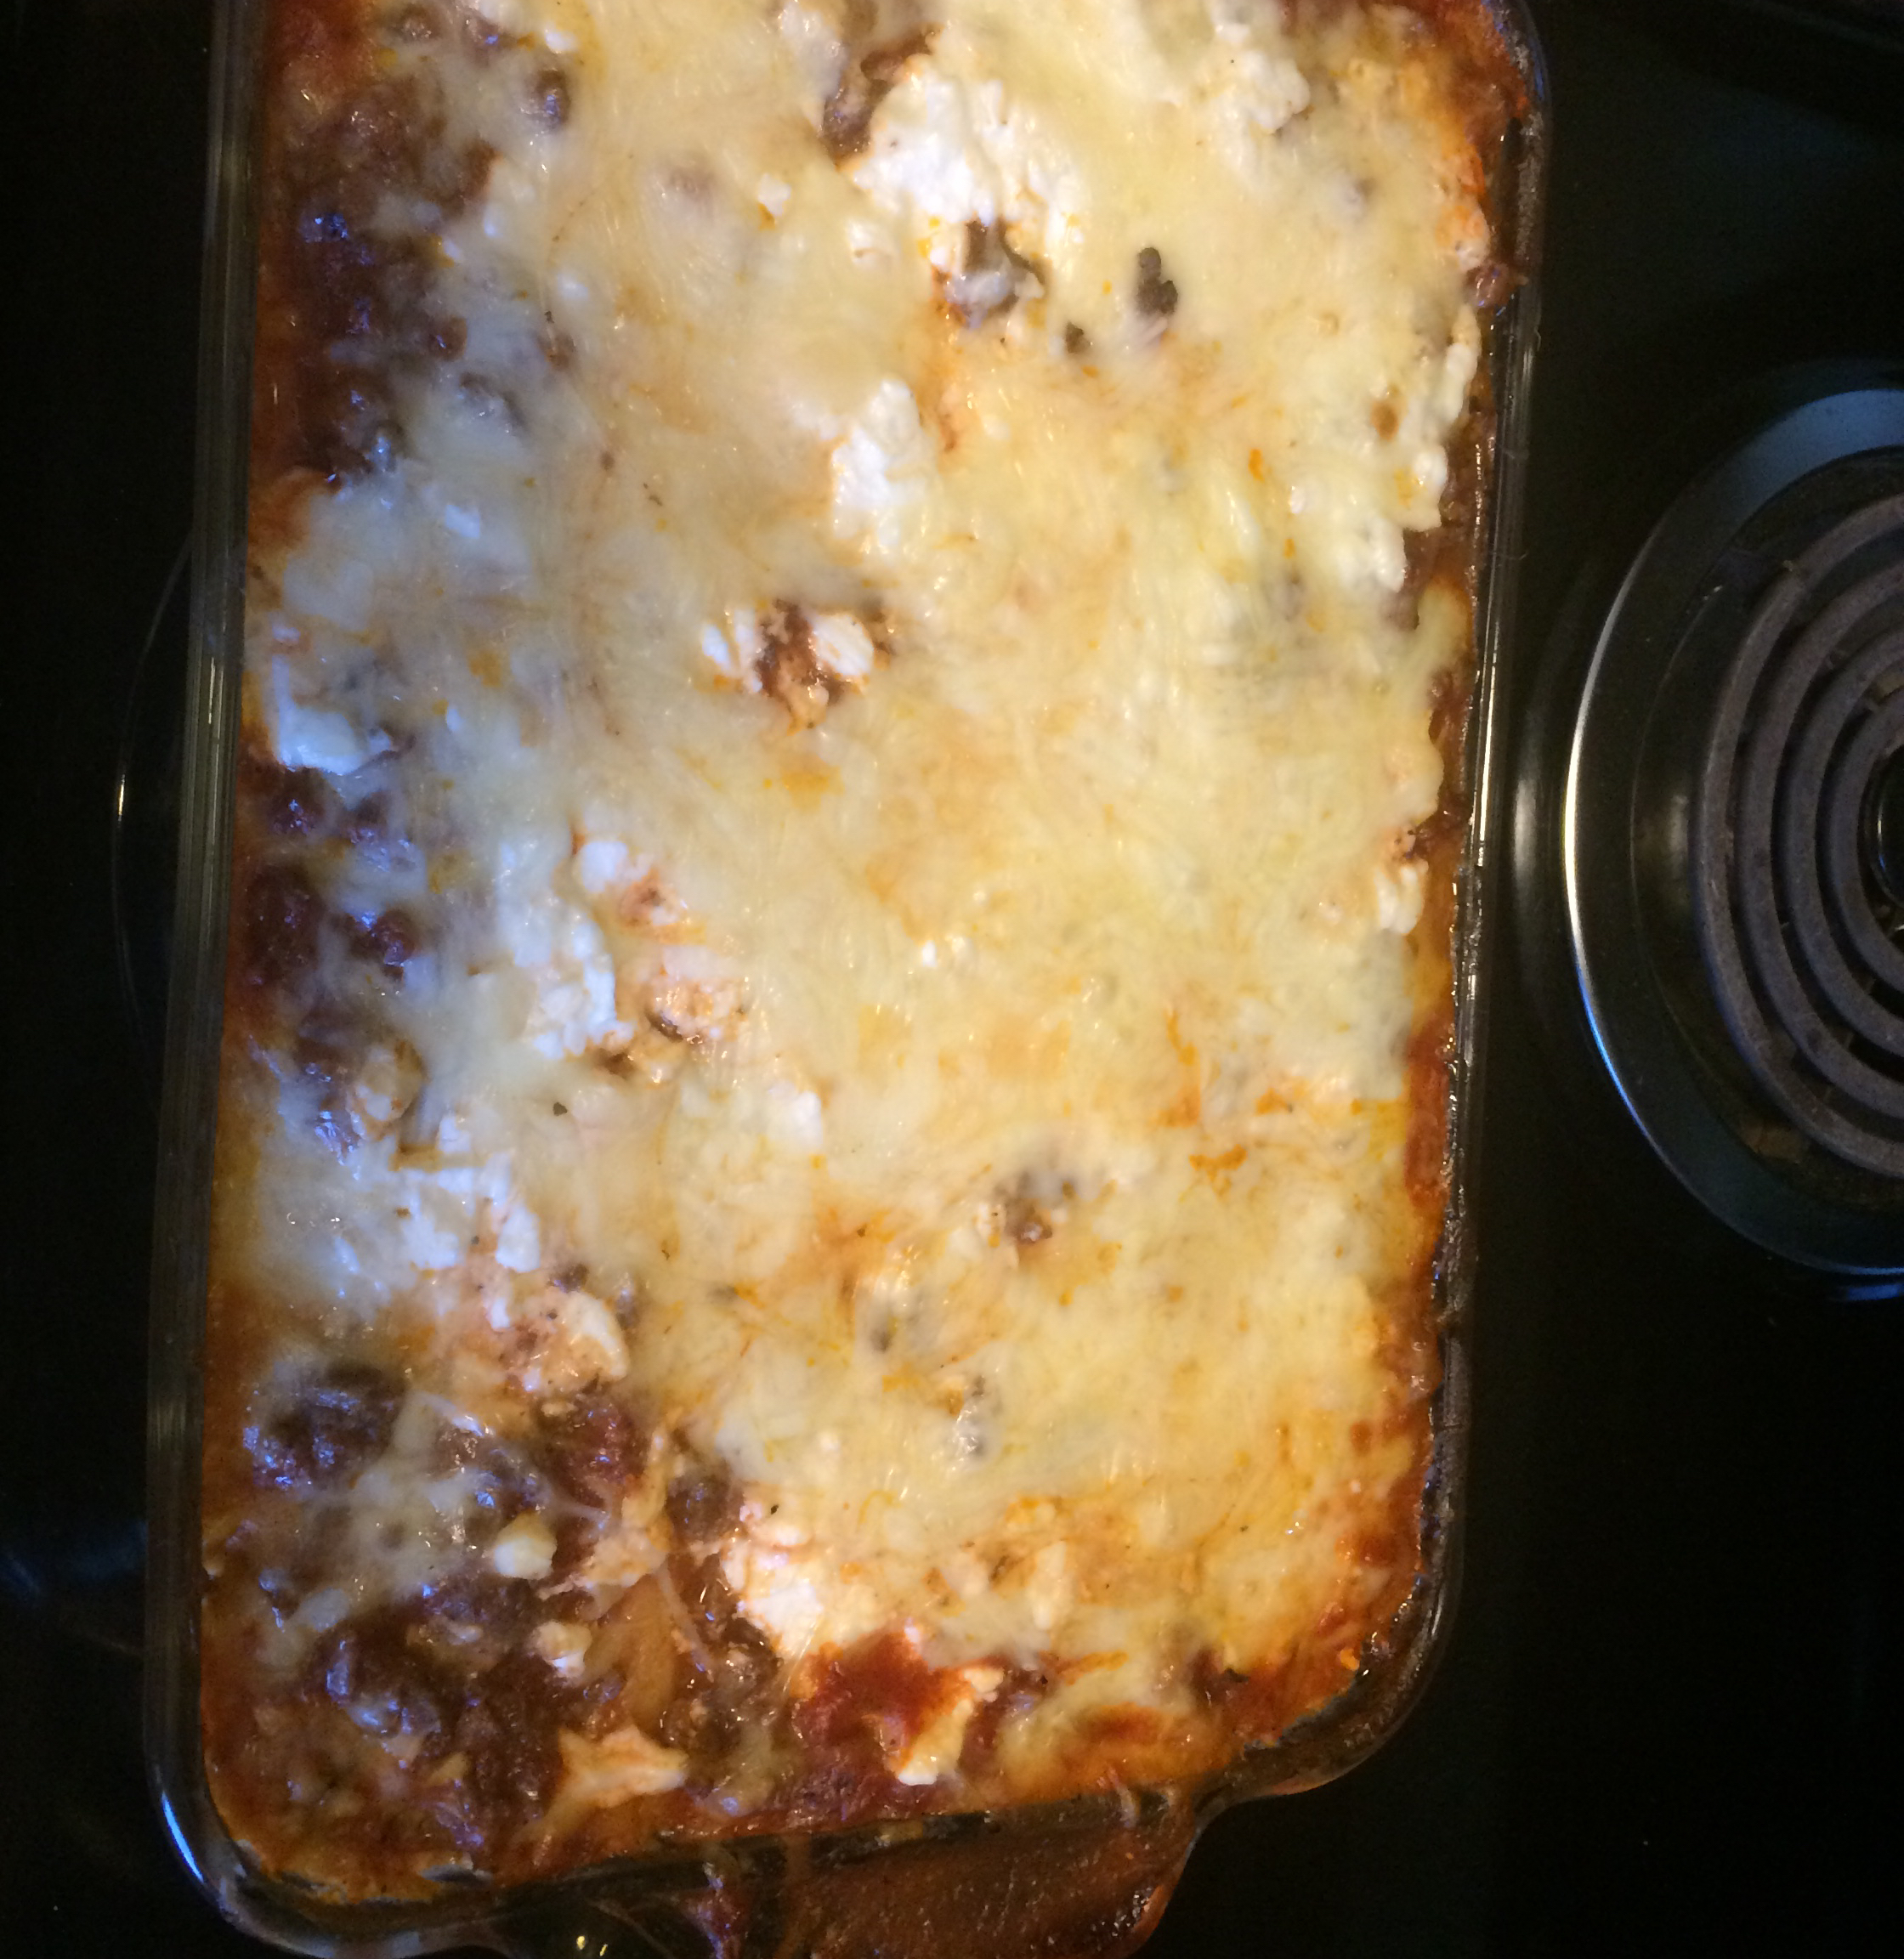 Grammy's Overnight Lasagna tommyjoe